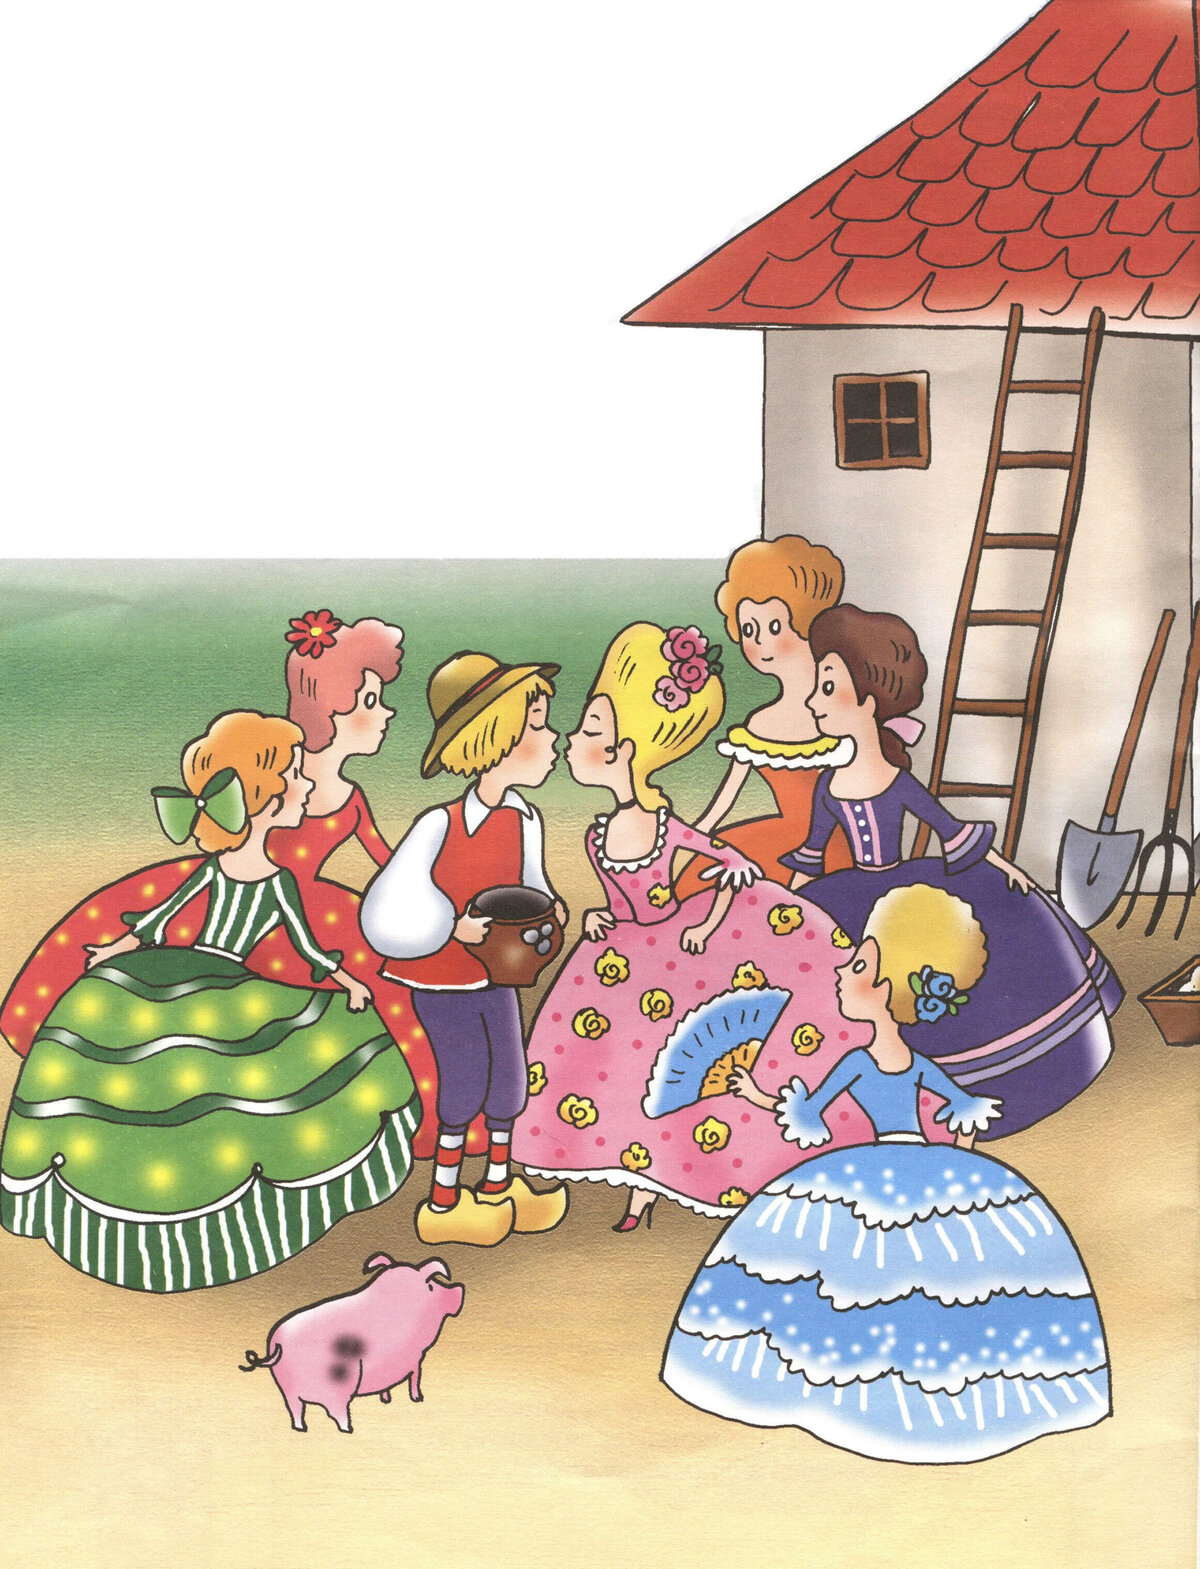 Картинки по сказке андерсена свинопас